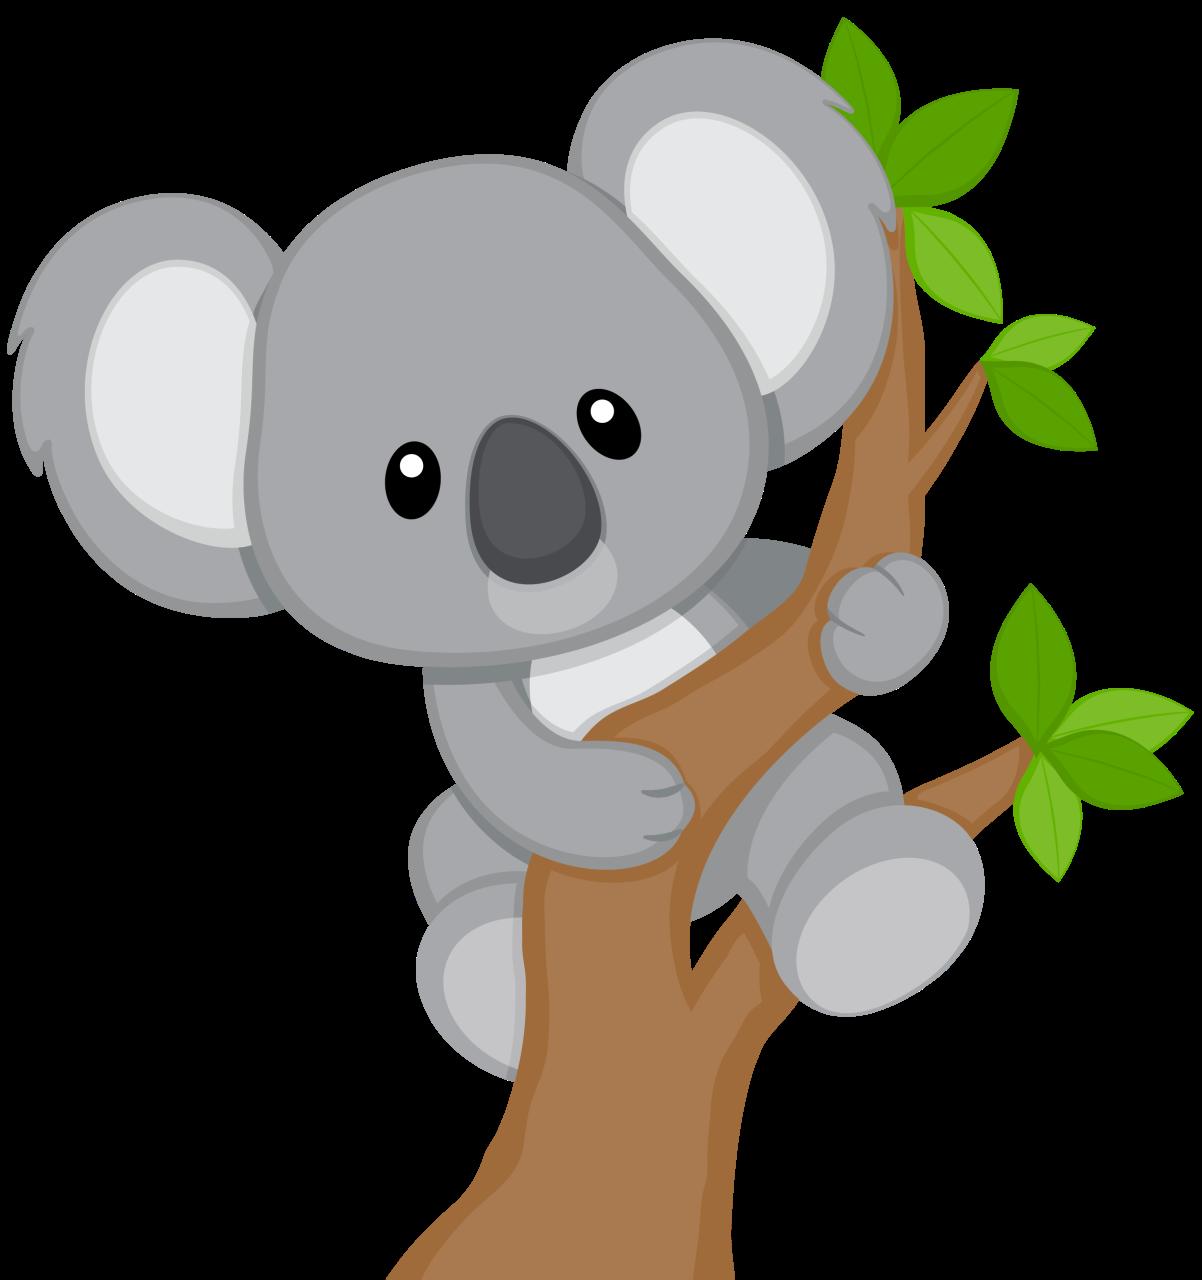 0 103df3 a4aabede orig 1202 1280 cute pinterest clip art rh pinterest ca baby koala bear clipart koala bear clipart black and white